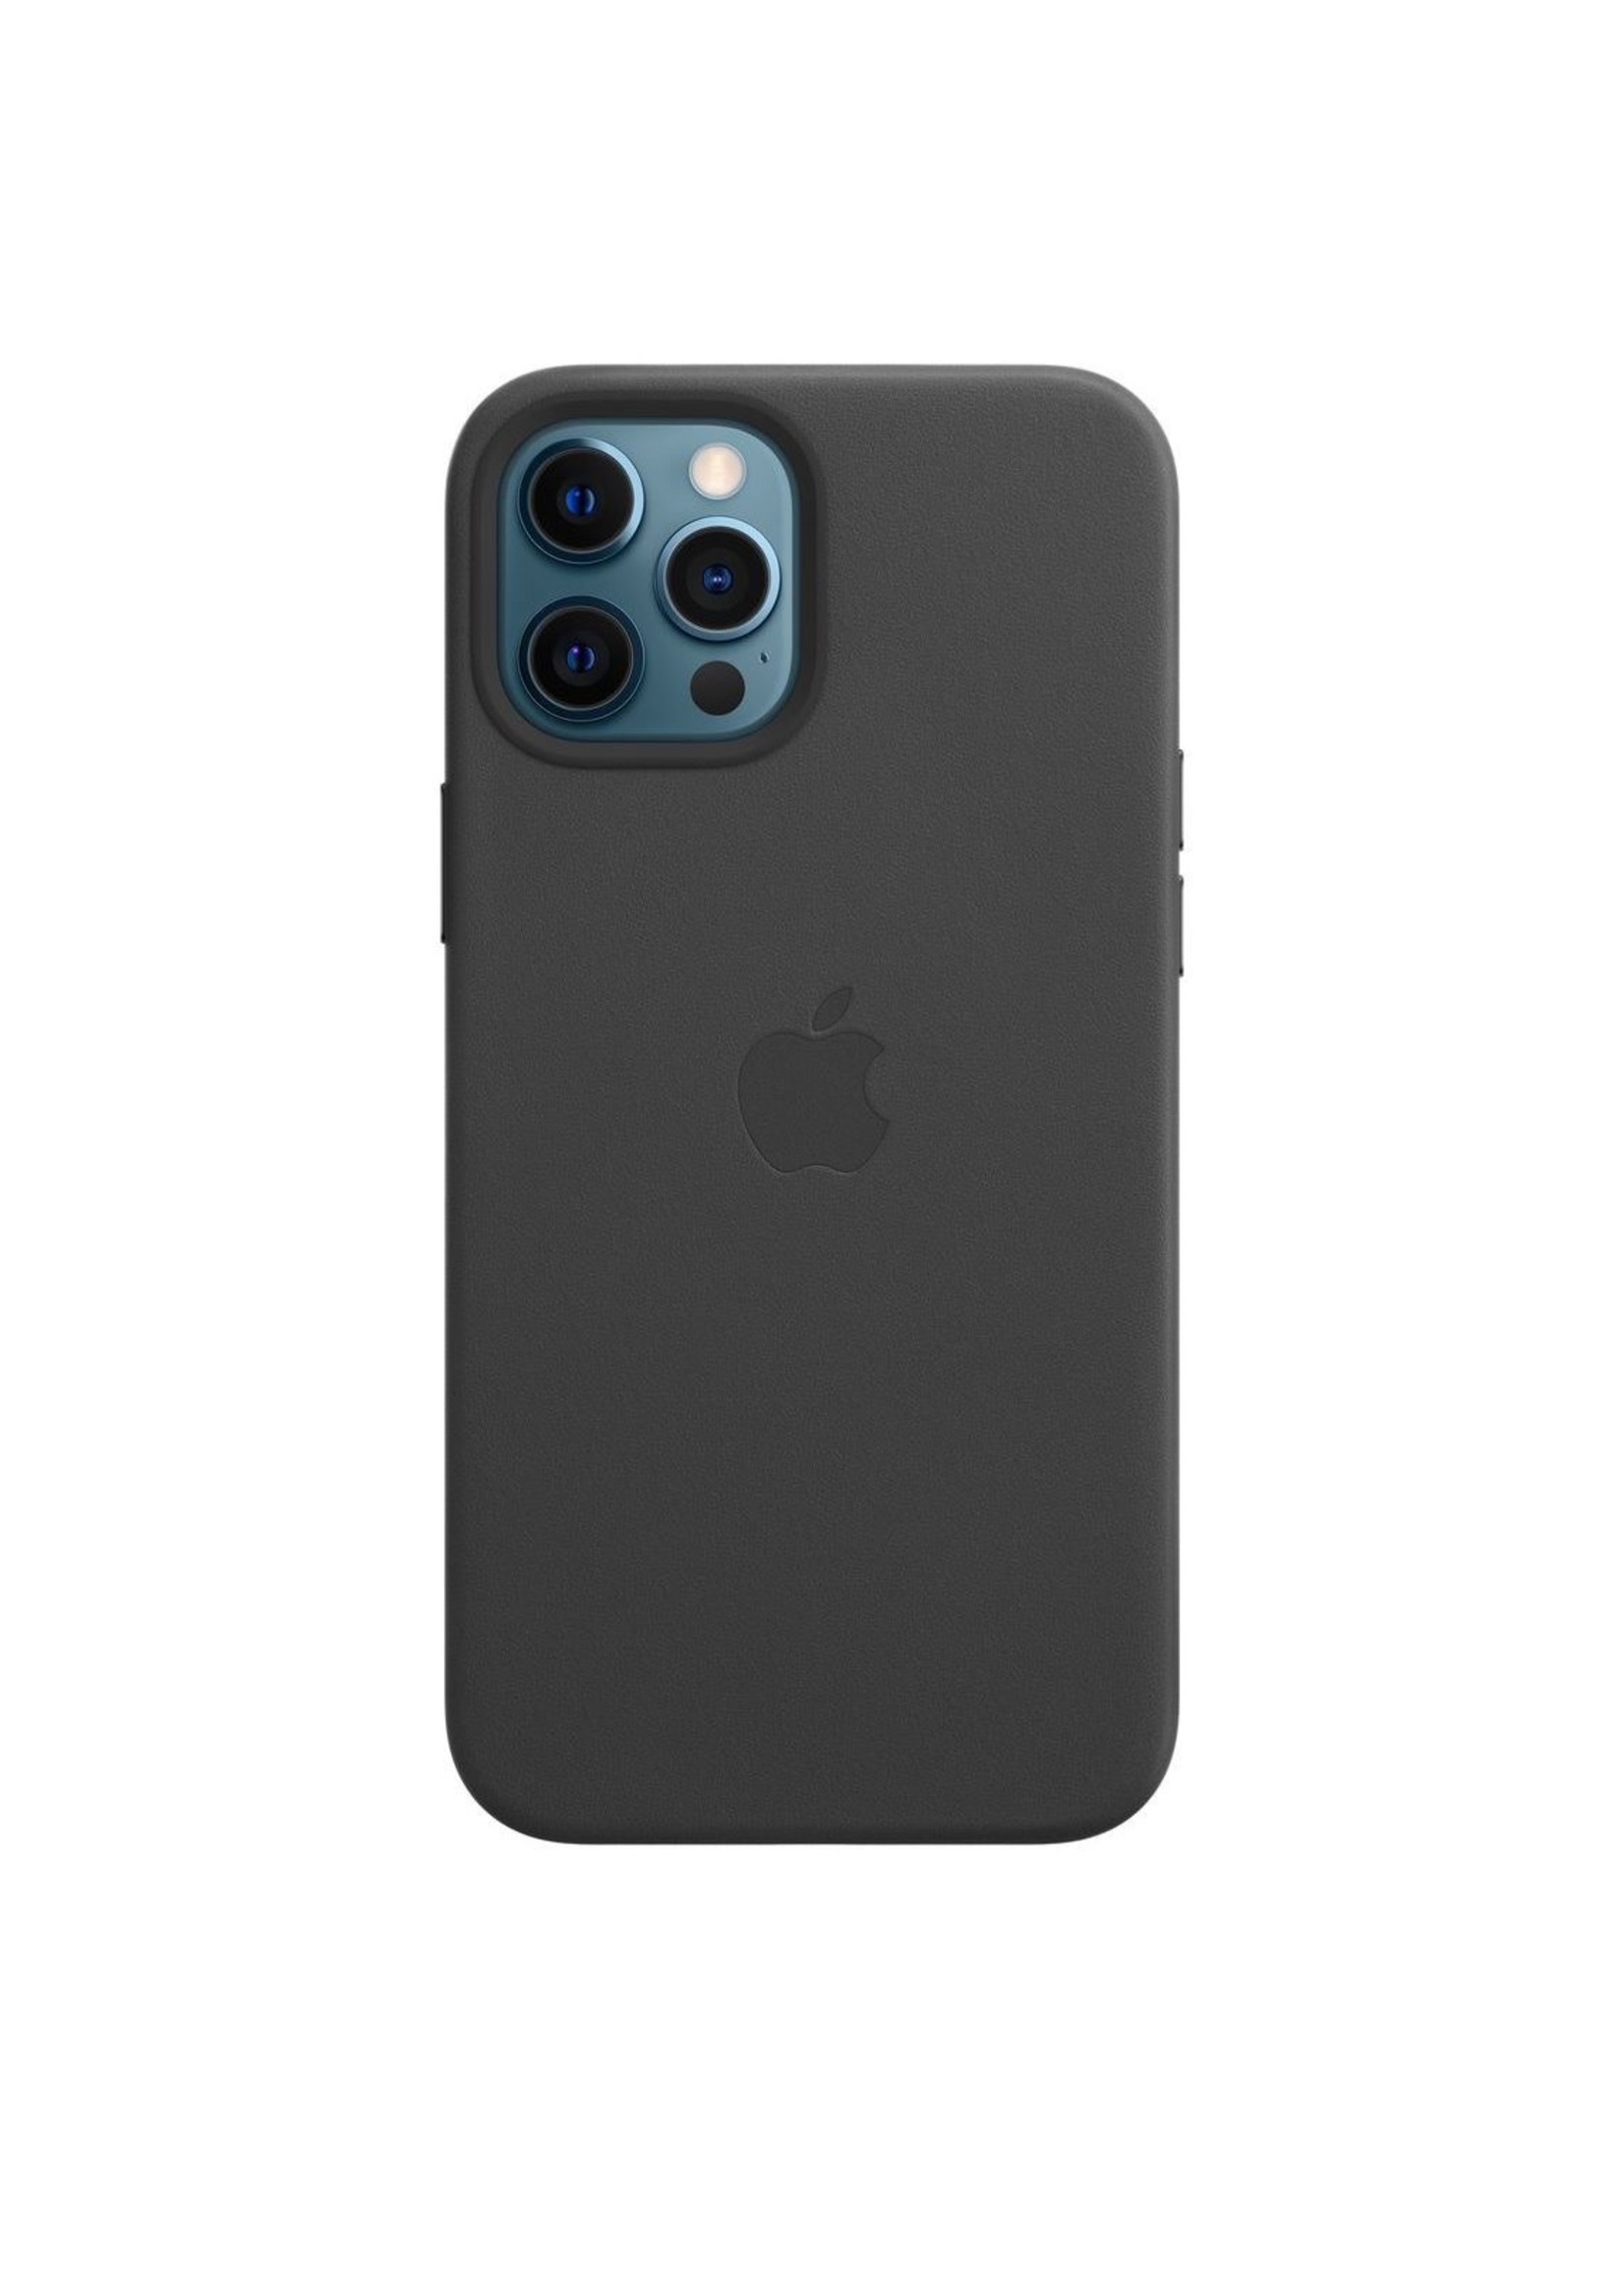 Apple iPhone 12 Pro Max Silicone Case Black